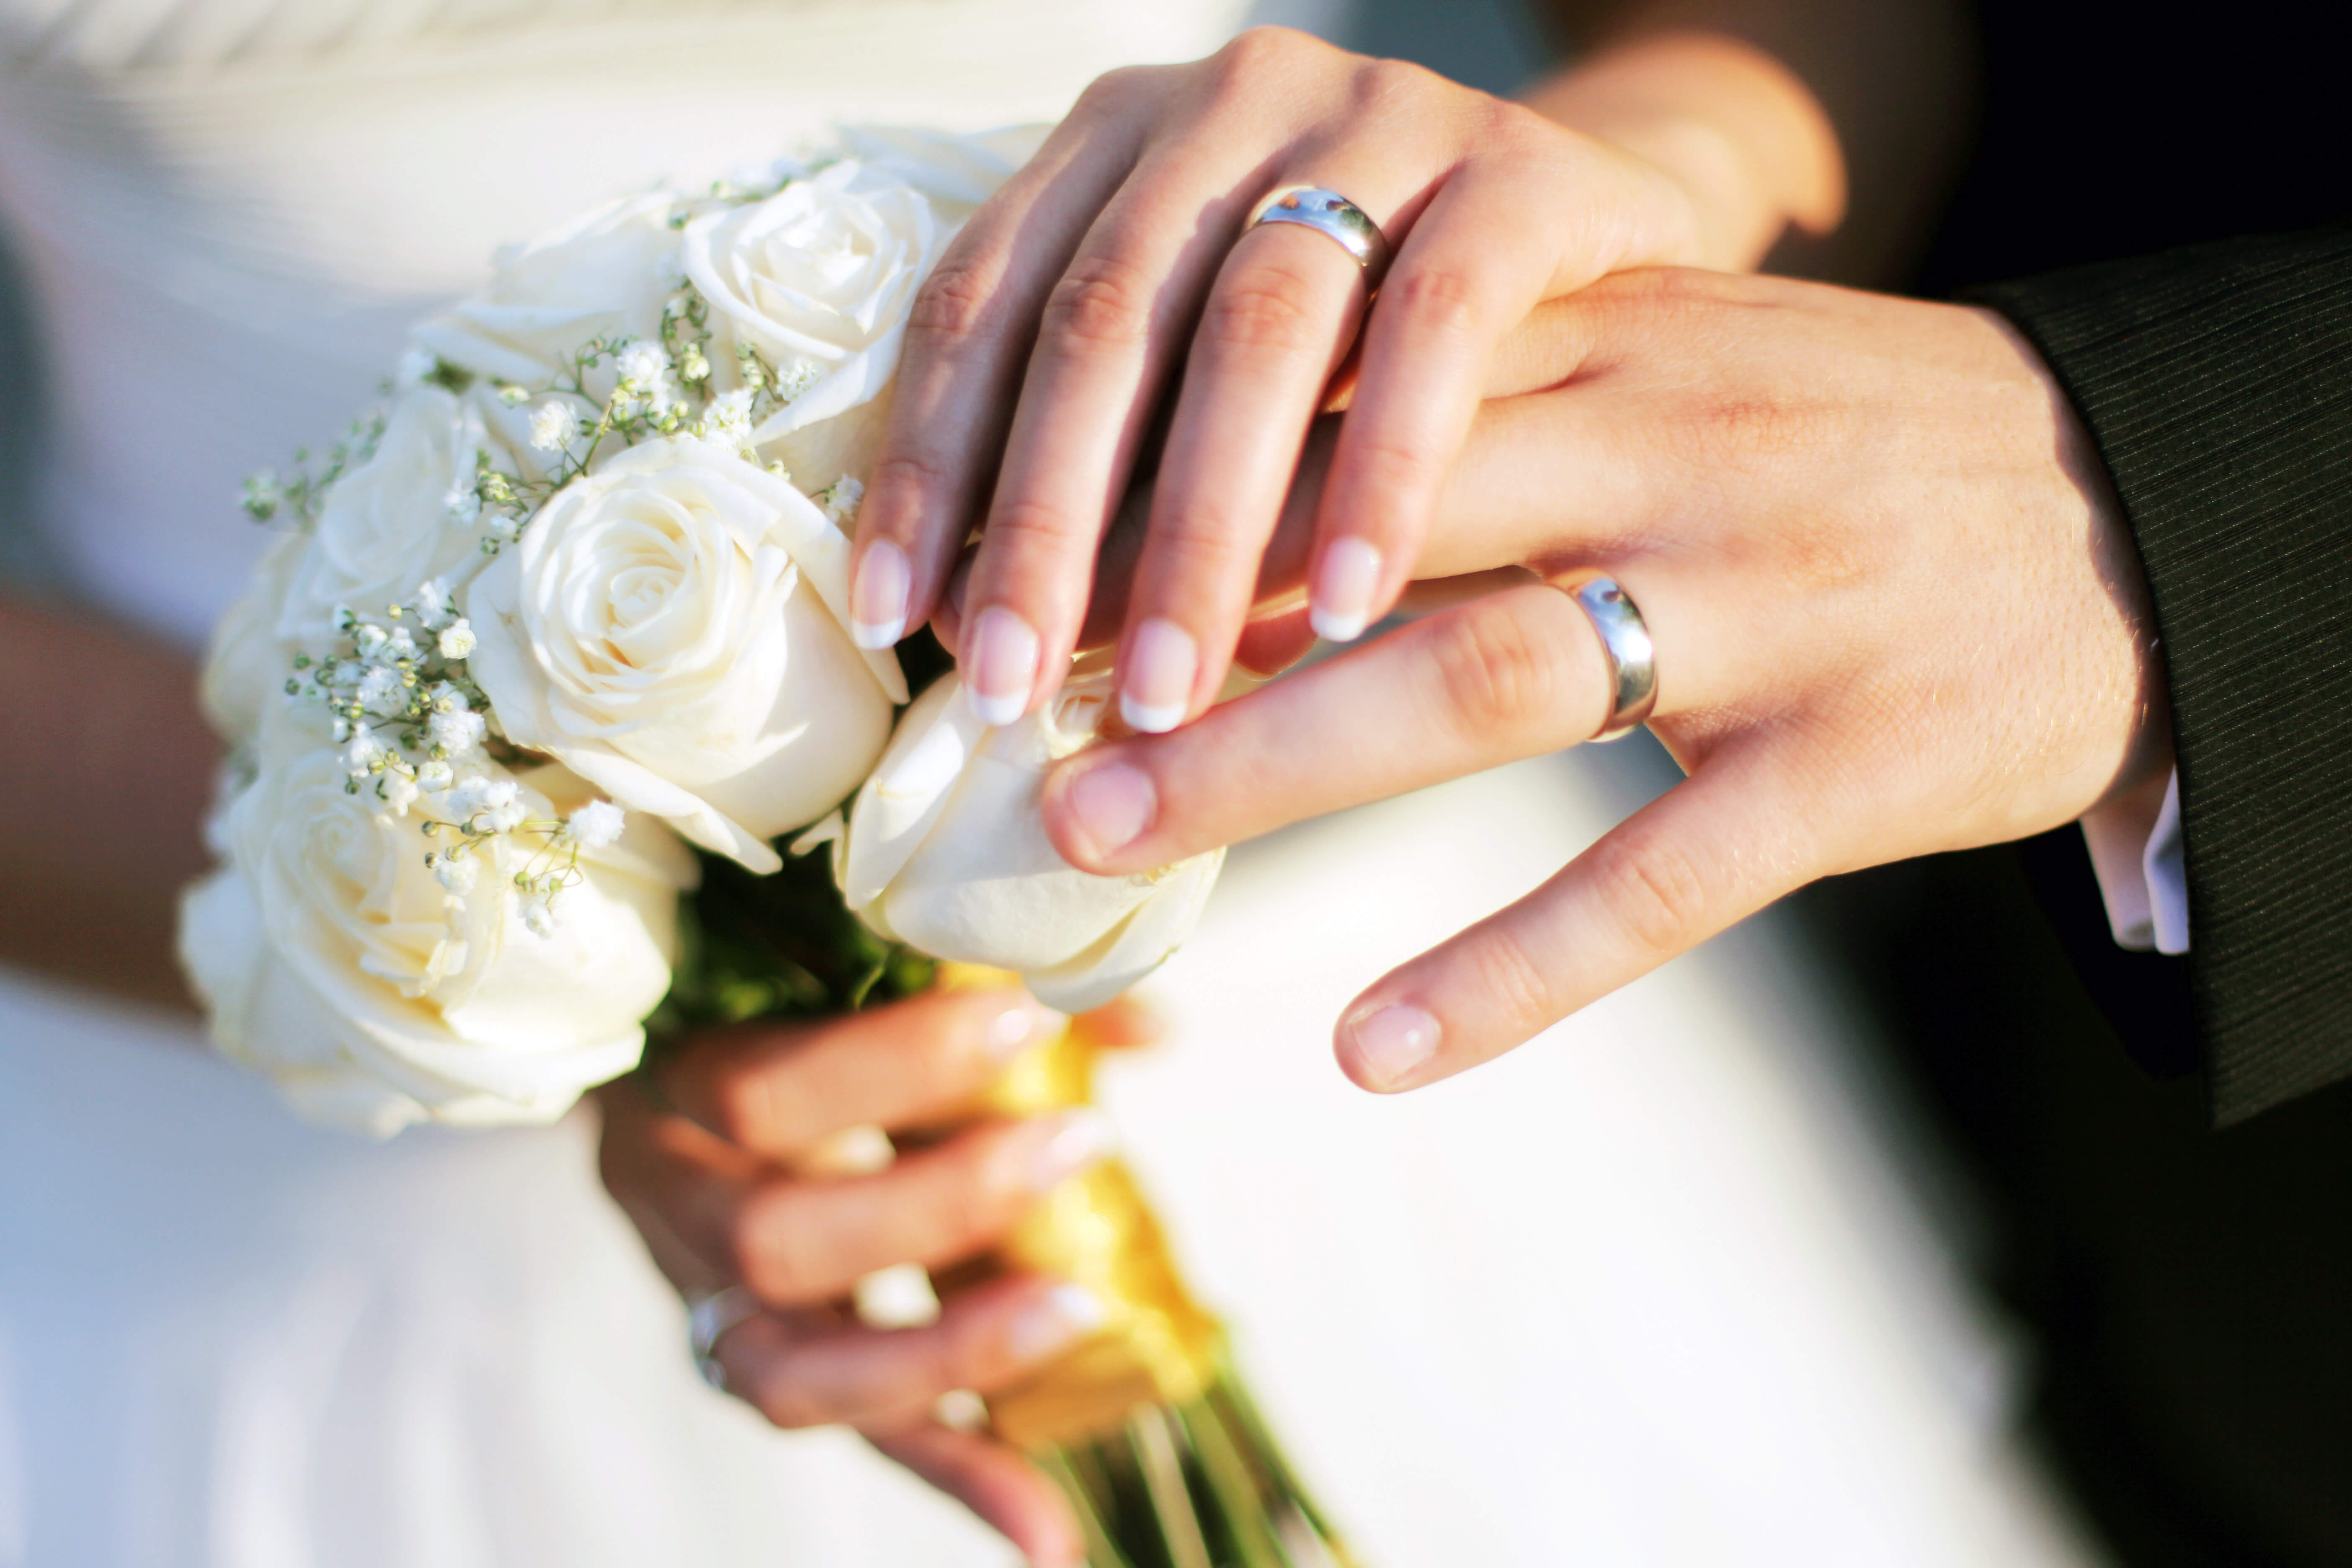 Wedding Spending And Divorce Rates